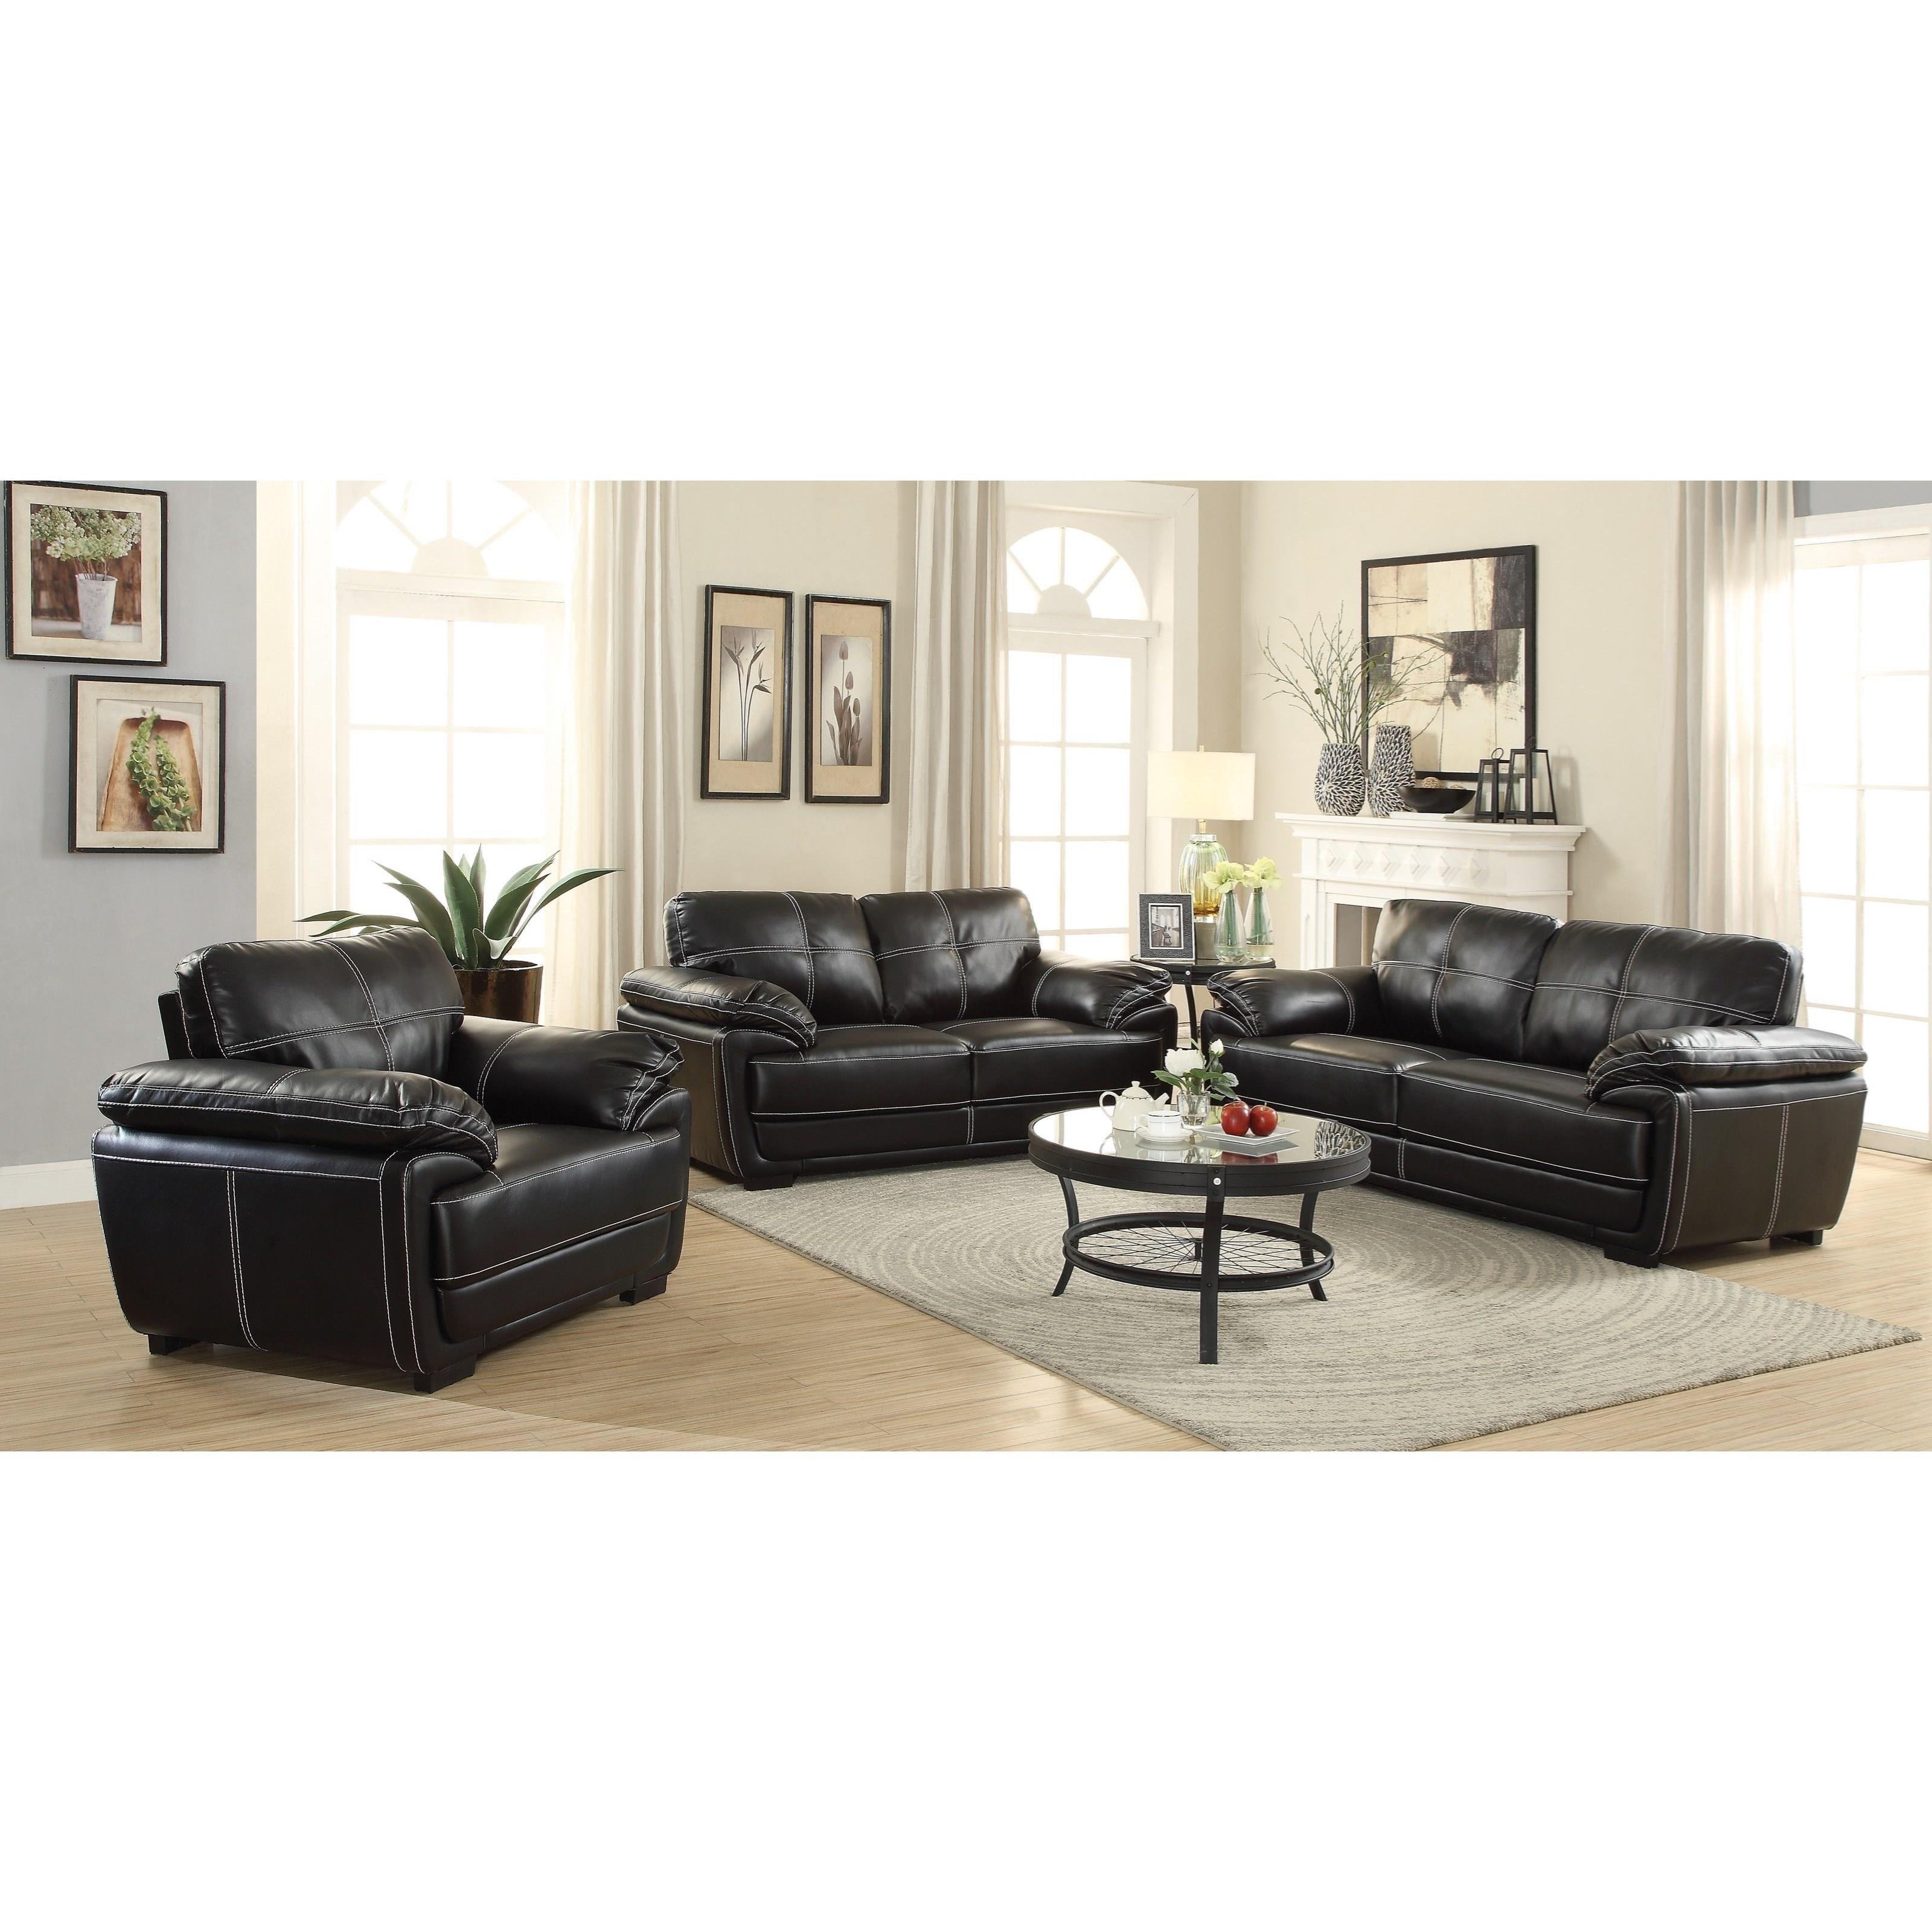 Coaster zenon 551252 plush loveseat with baseball for Plush living room furniture